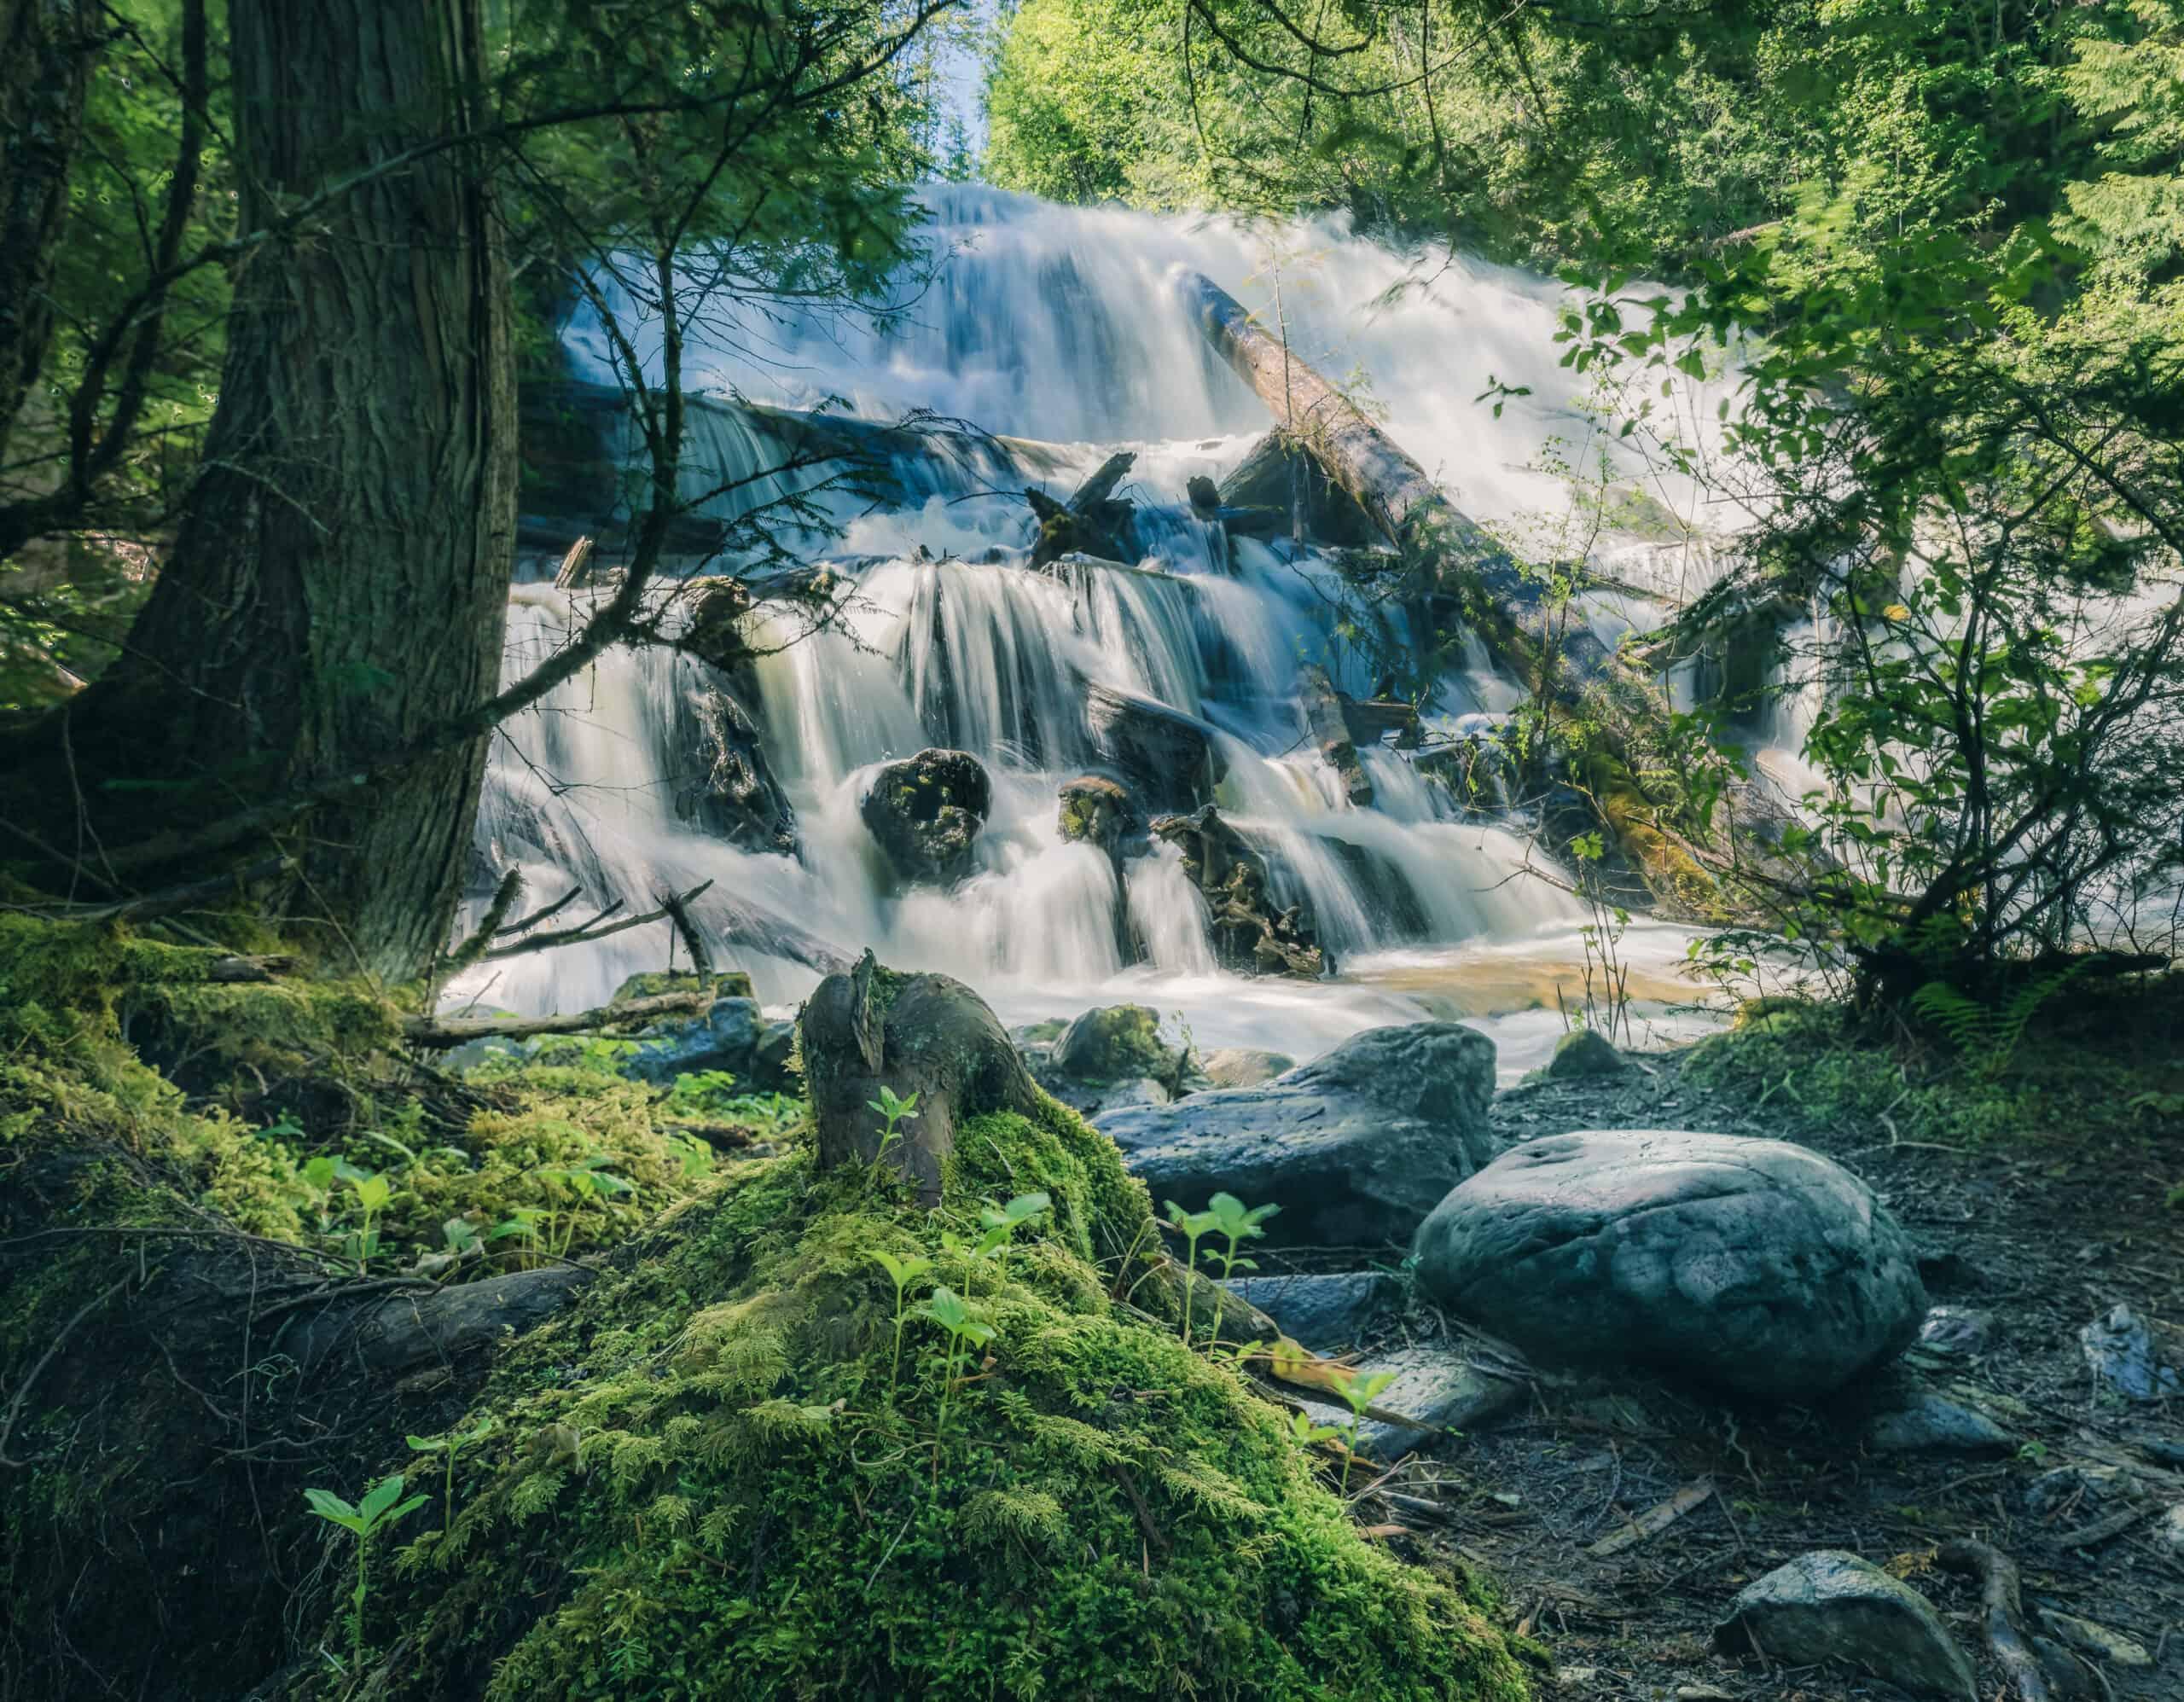 Revelstoke Waterfalls Moses Falls